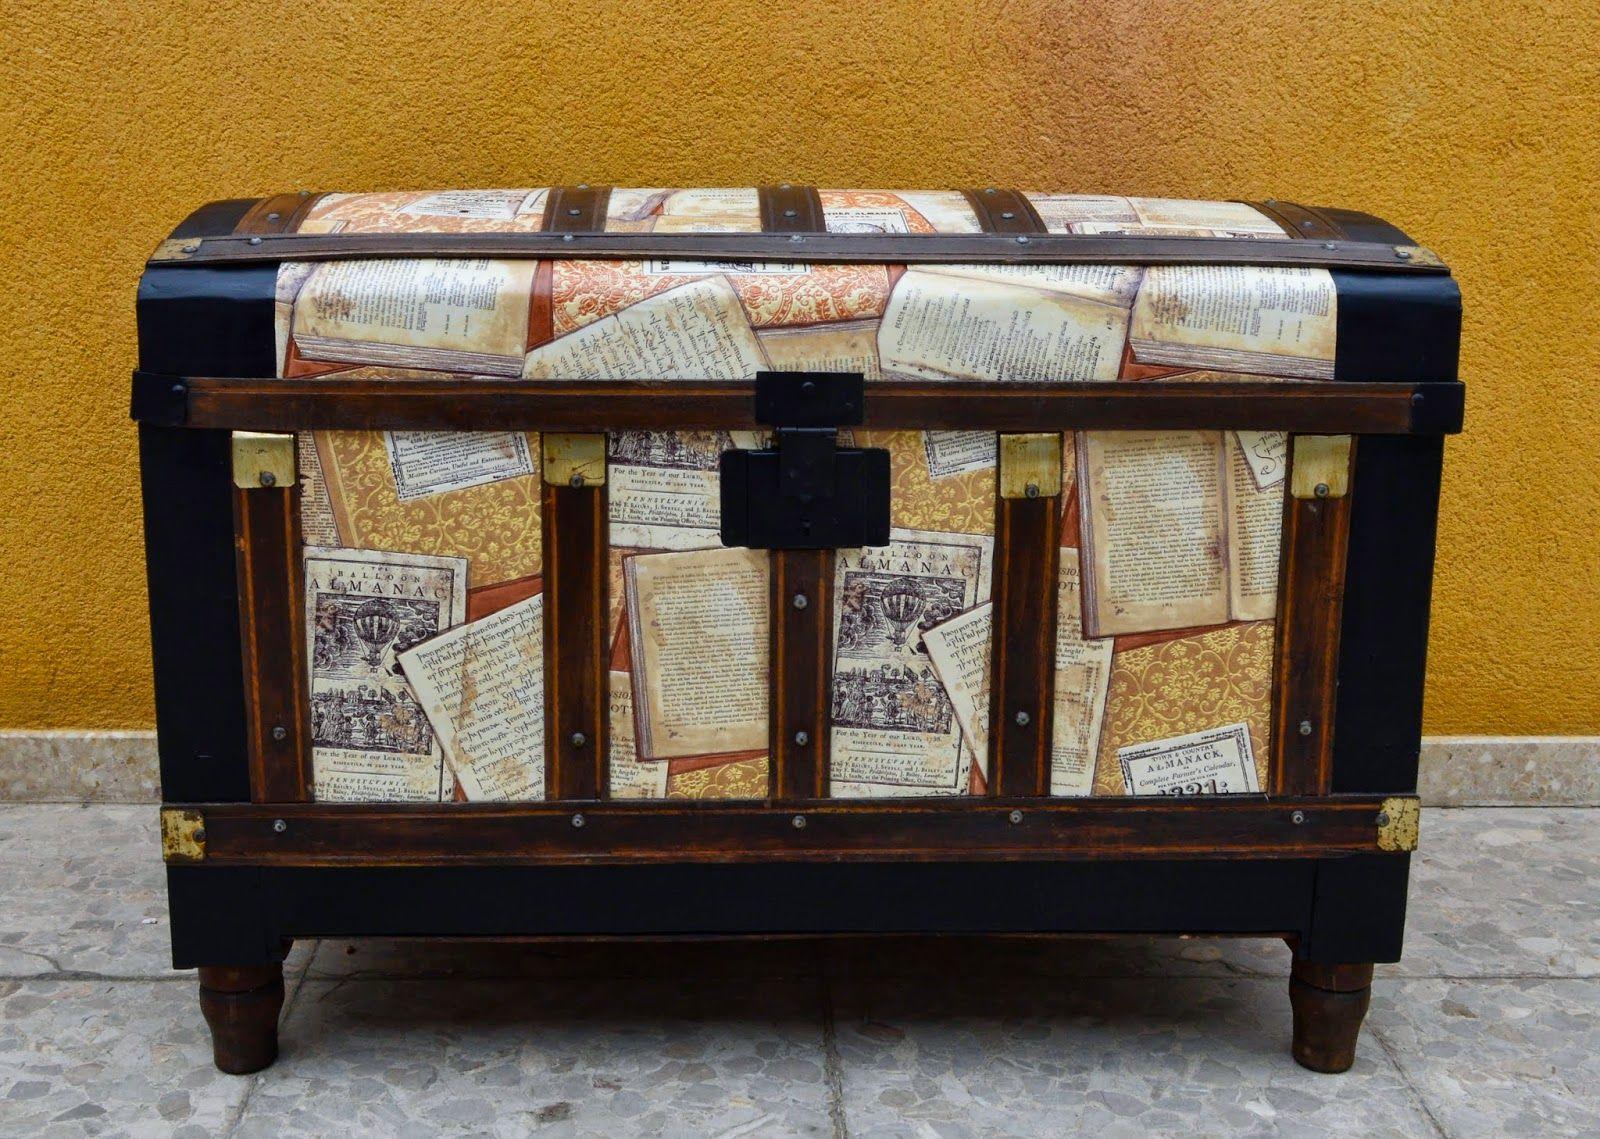 Transformar muebles antiguos en modernos me apasiona - Transformar muebles antiguos ...